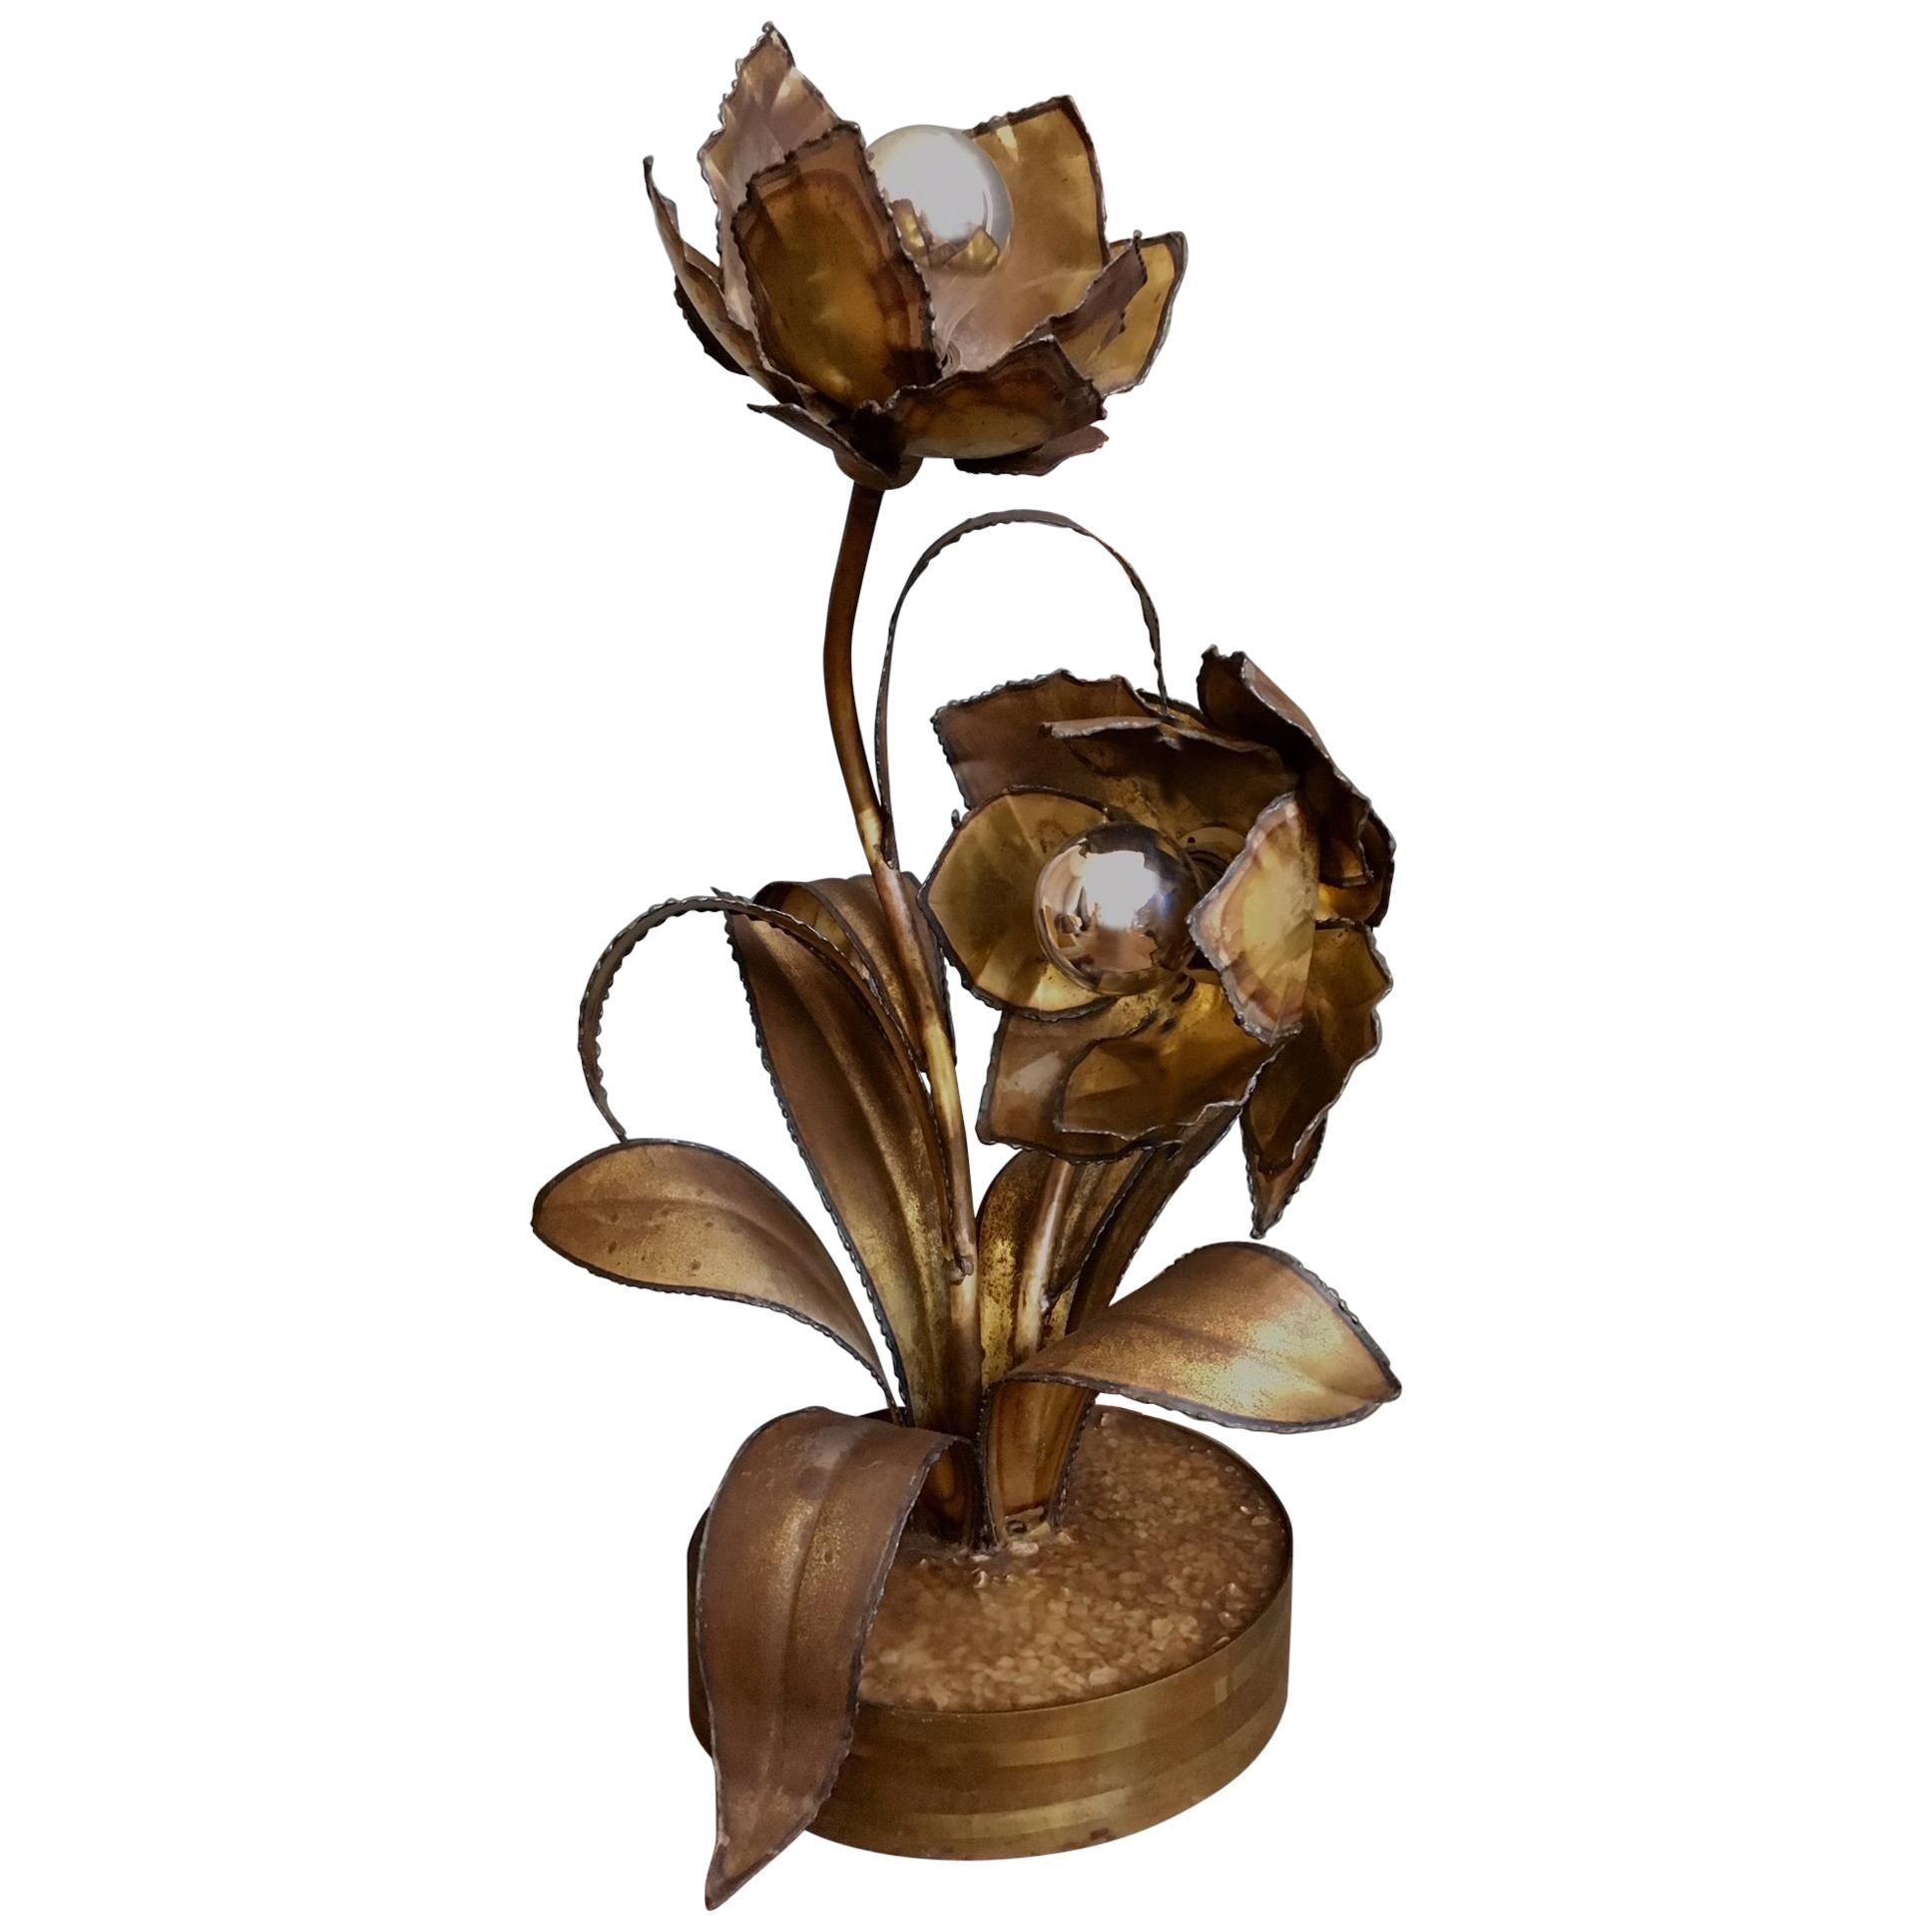 Vintage Maison Jansen Rose Table Lamp in Brass